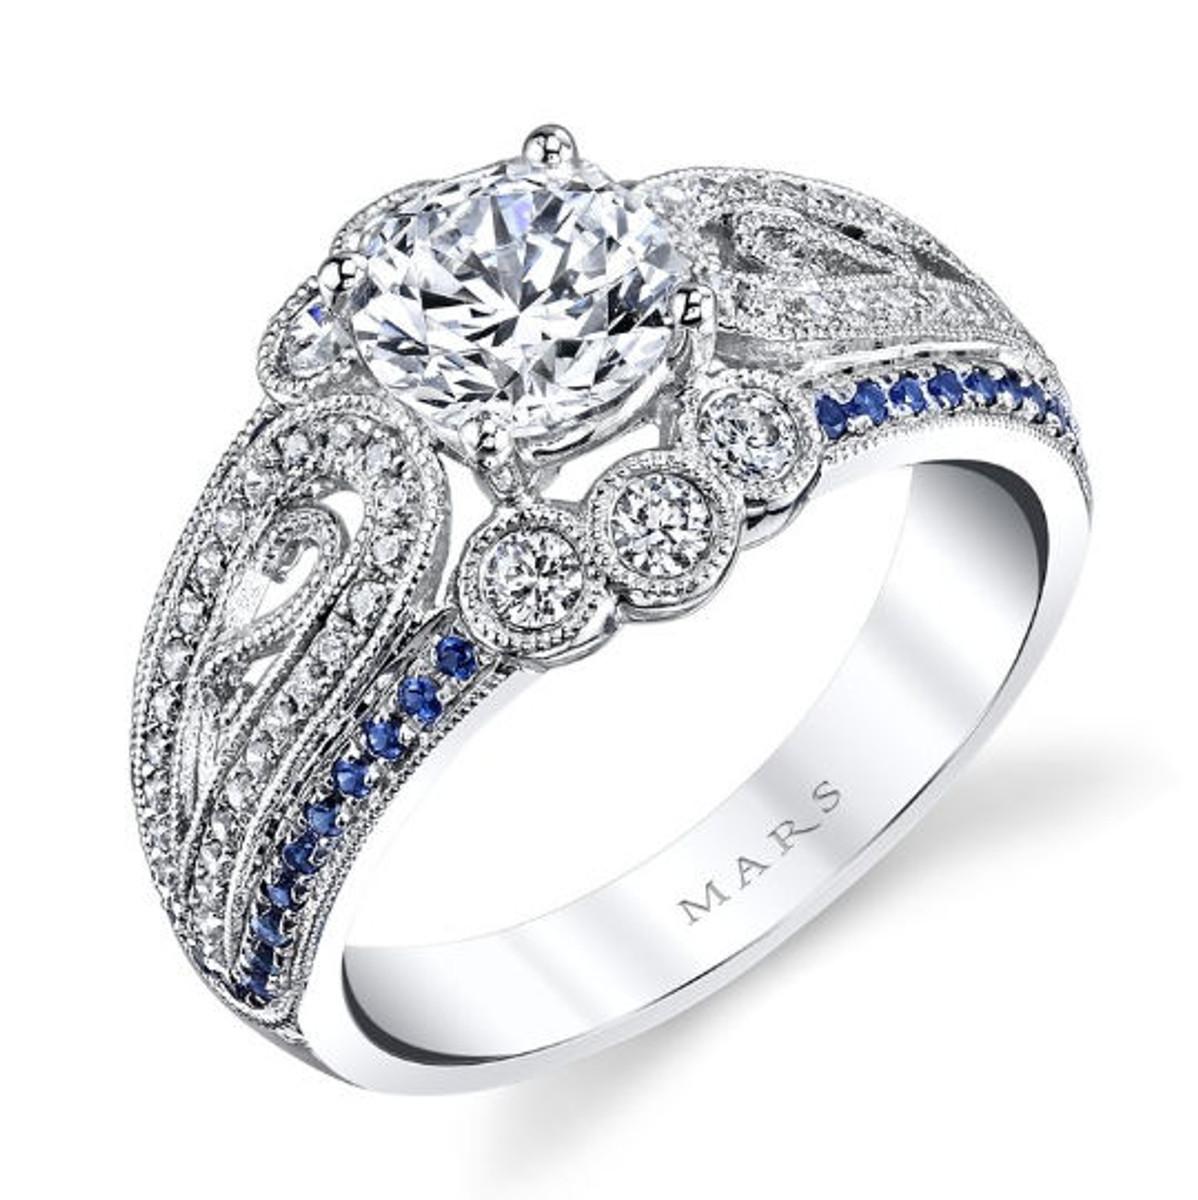 Vintage Diamond & Sapphire Engagement Ring